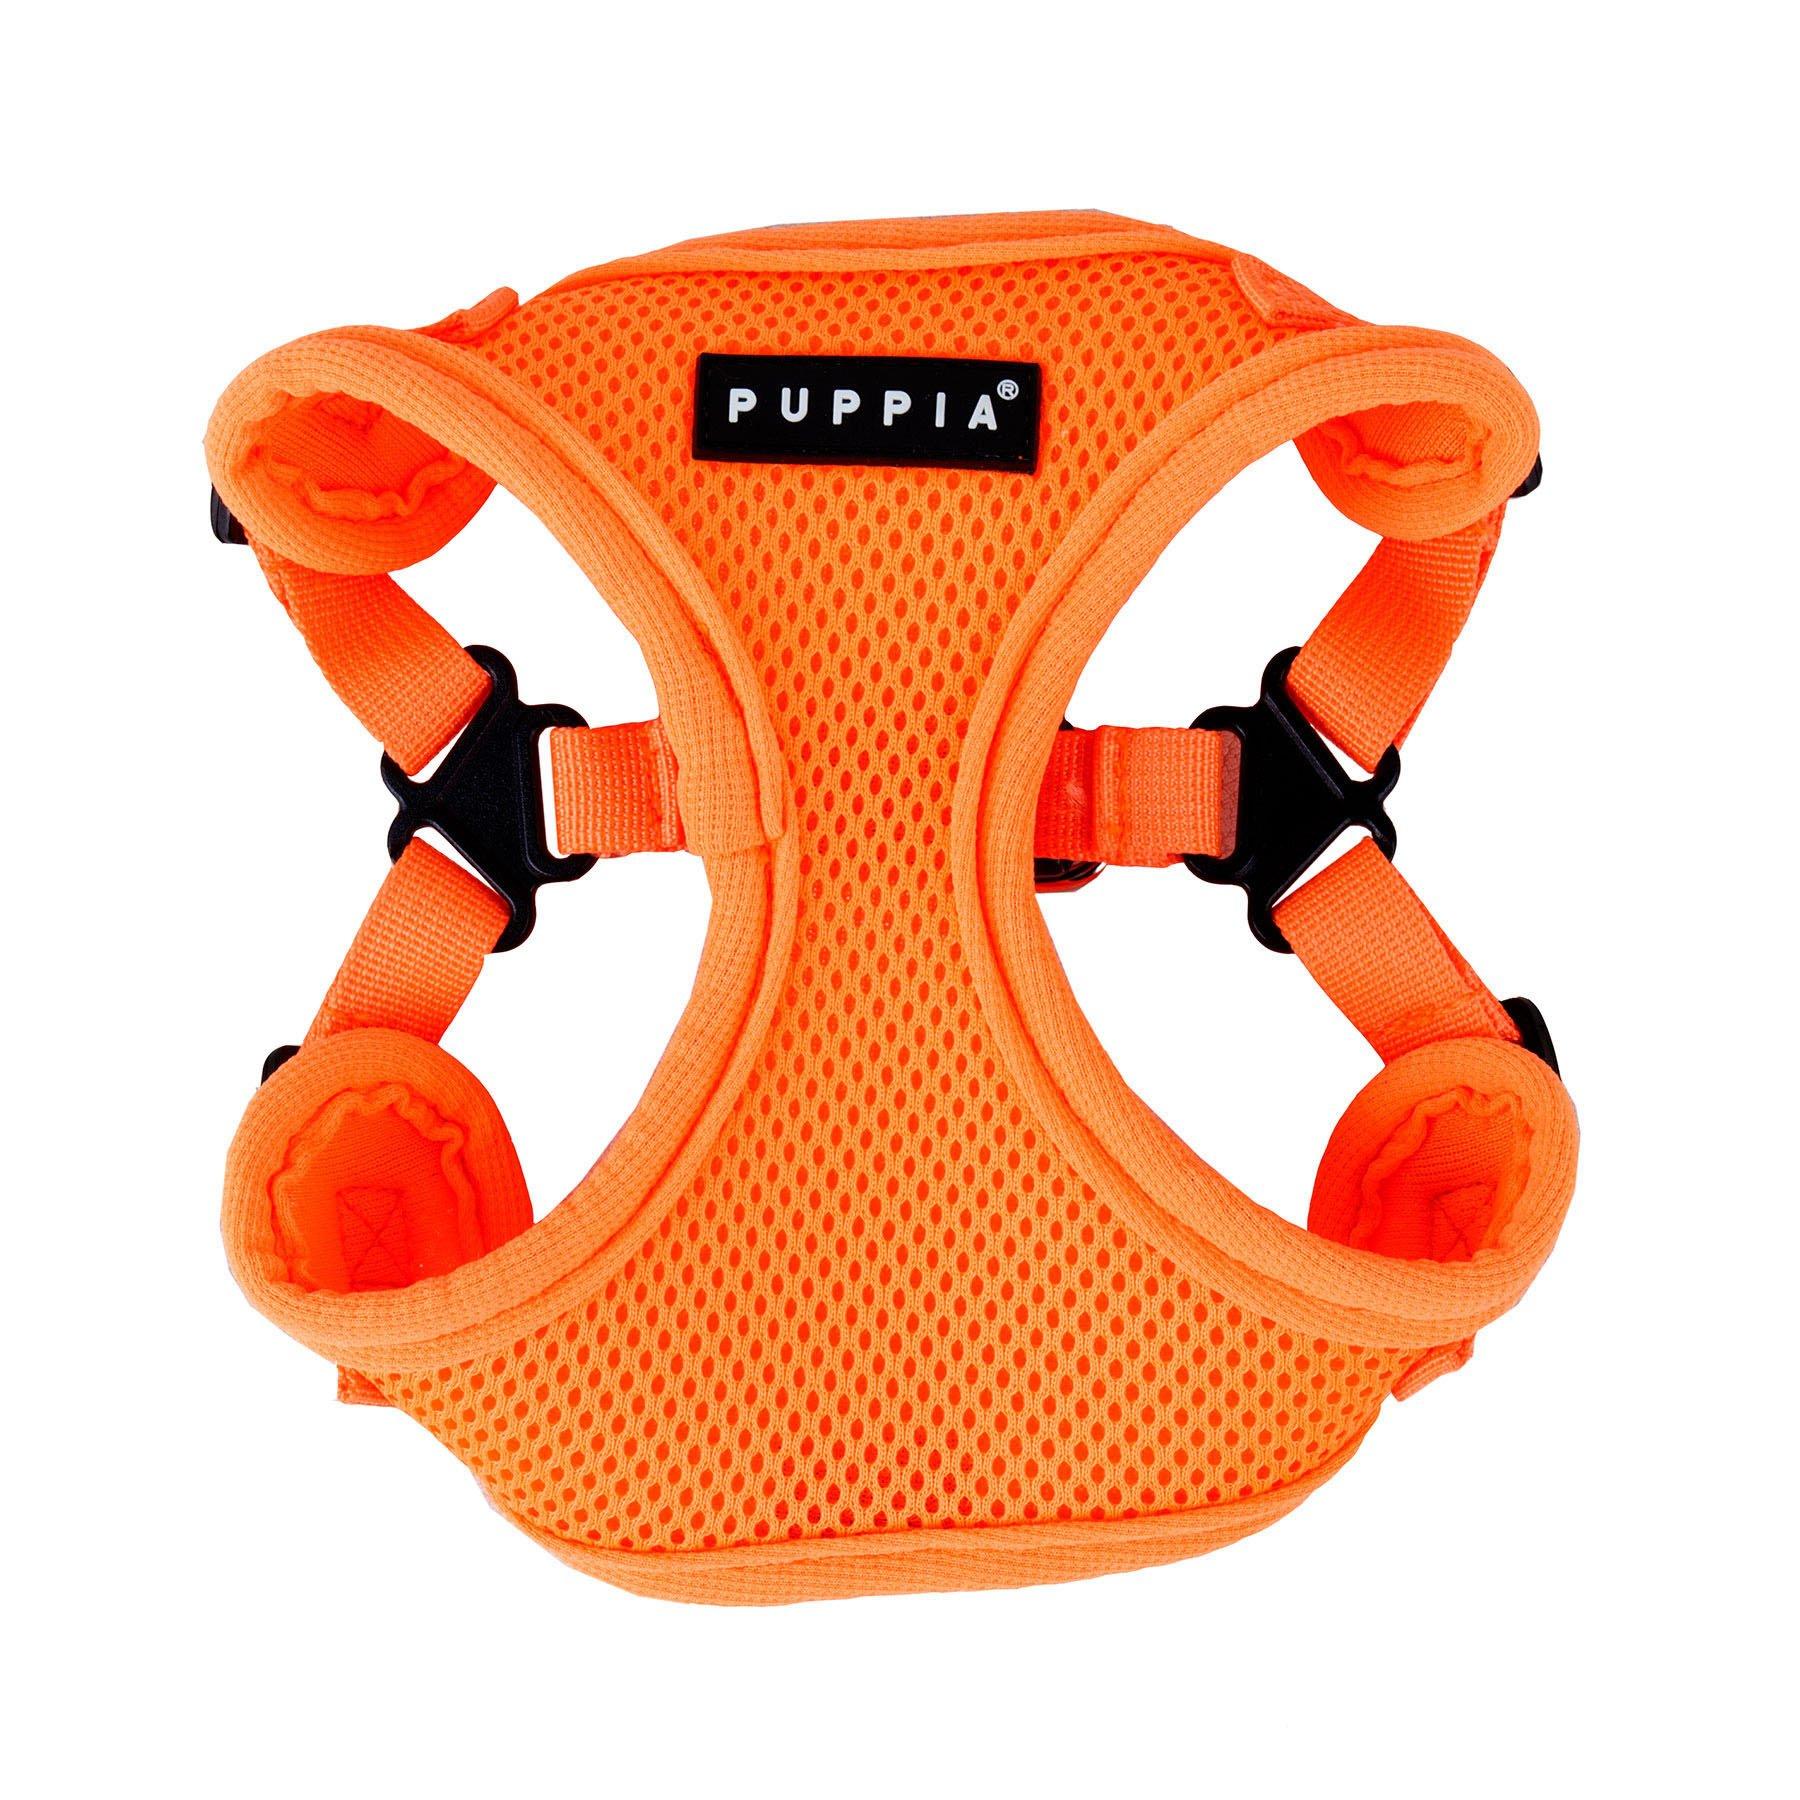 Puppia Authentic Neon Soft Harness C, Large, Orange